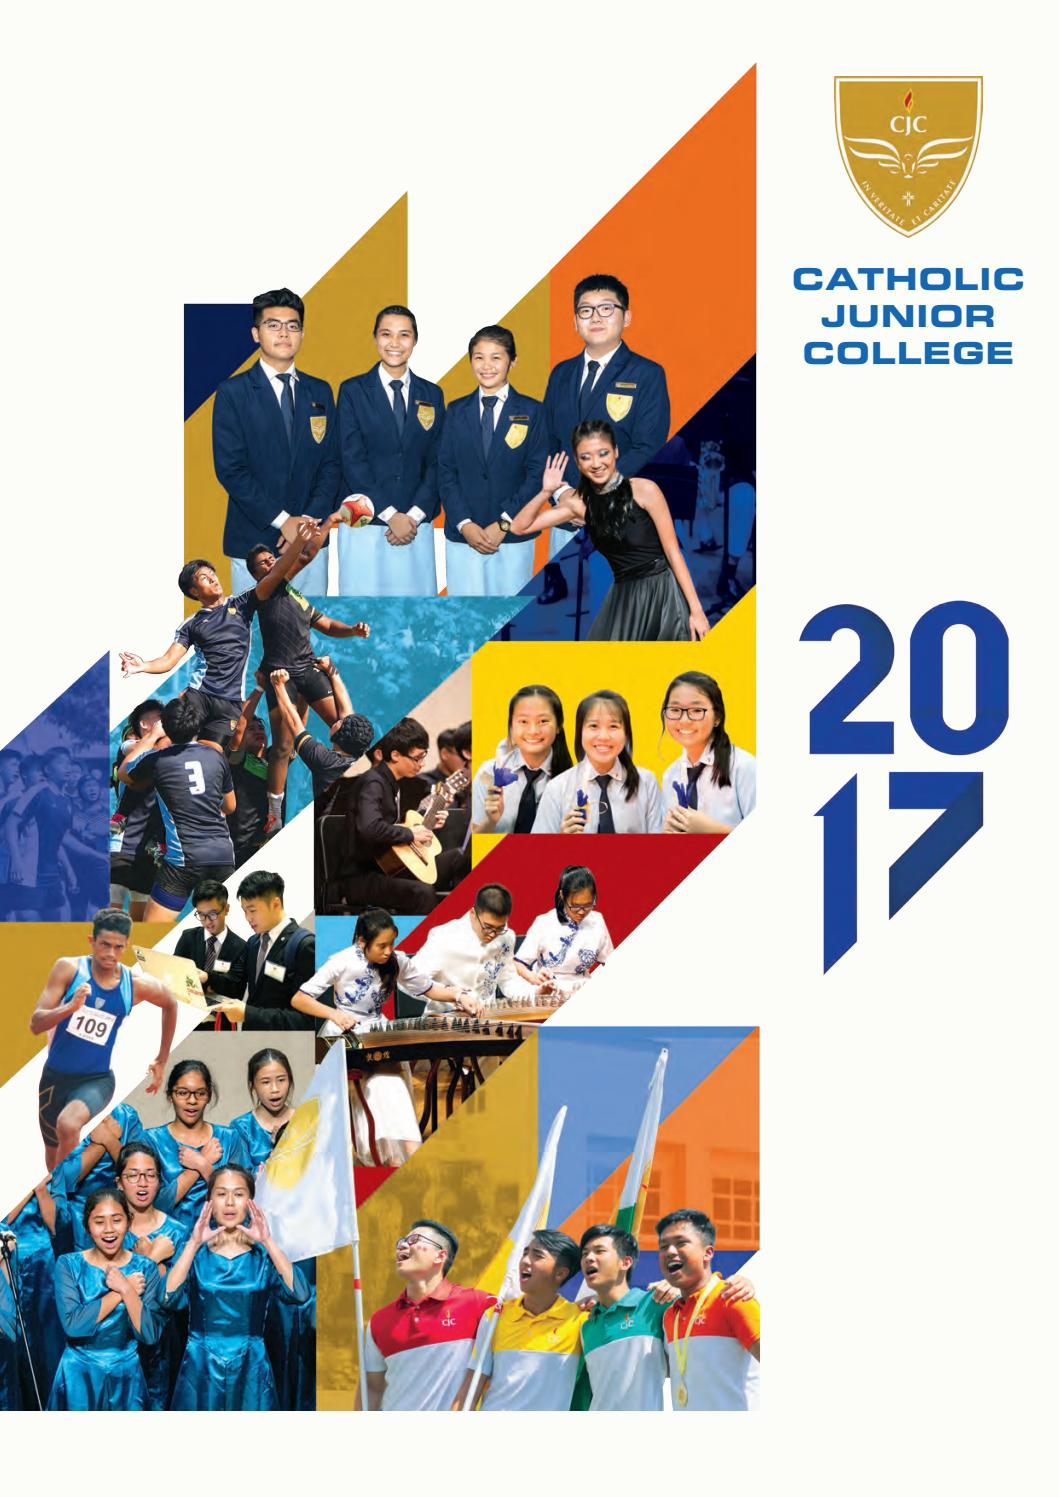 CJC Yearbook 2017 Part 1 by Catholic JC - issuu